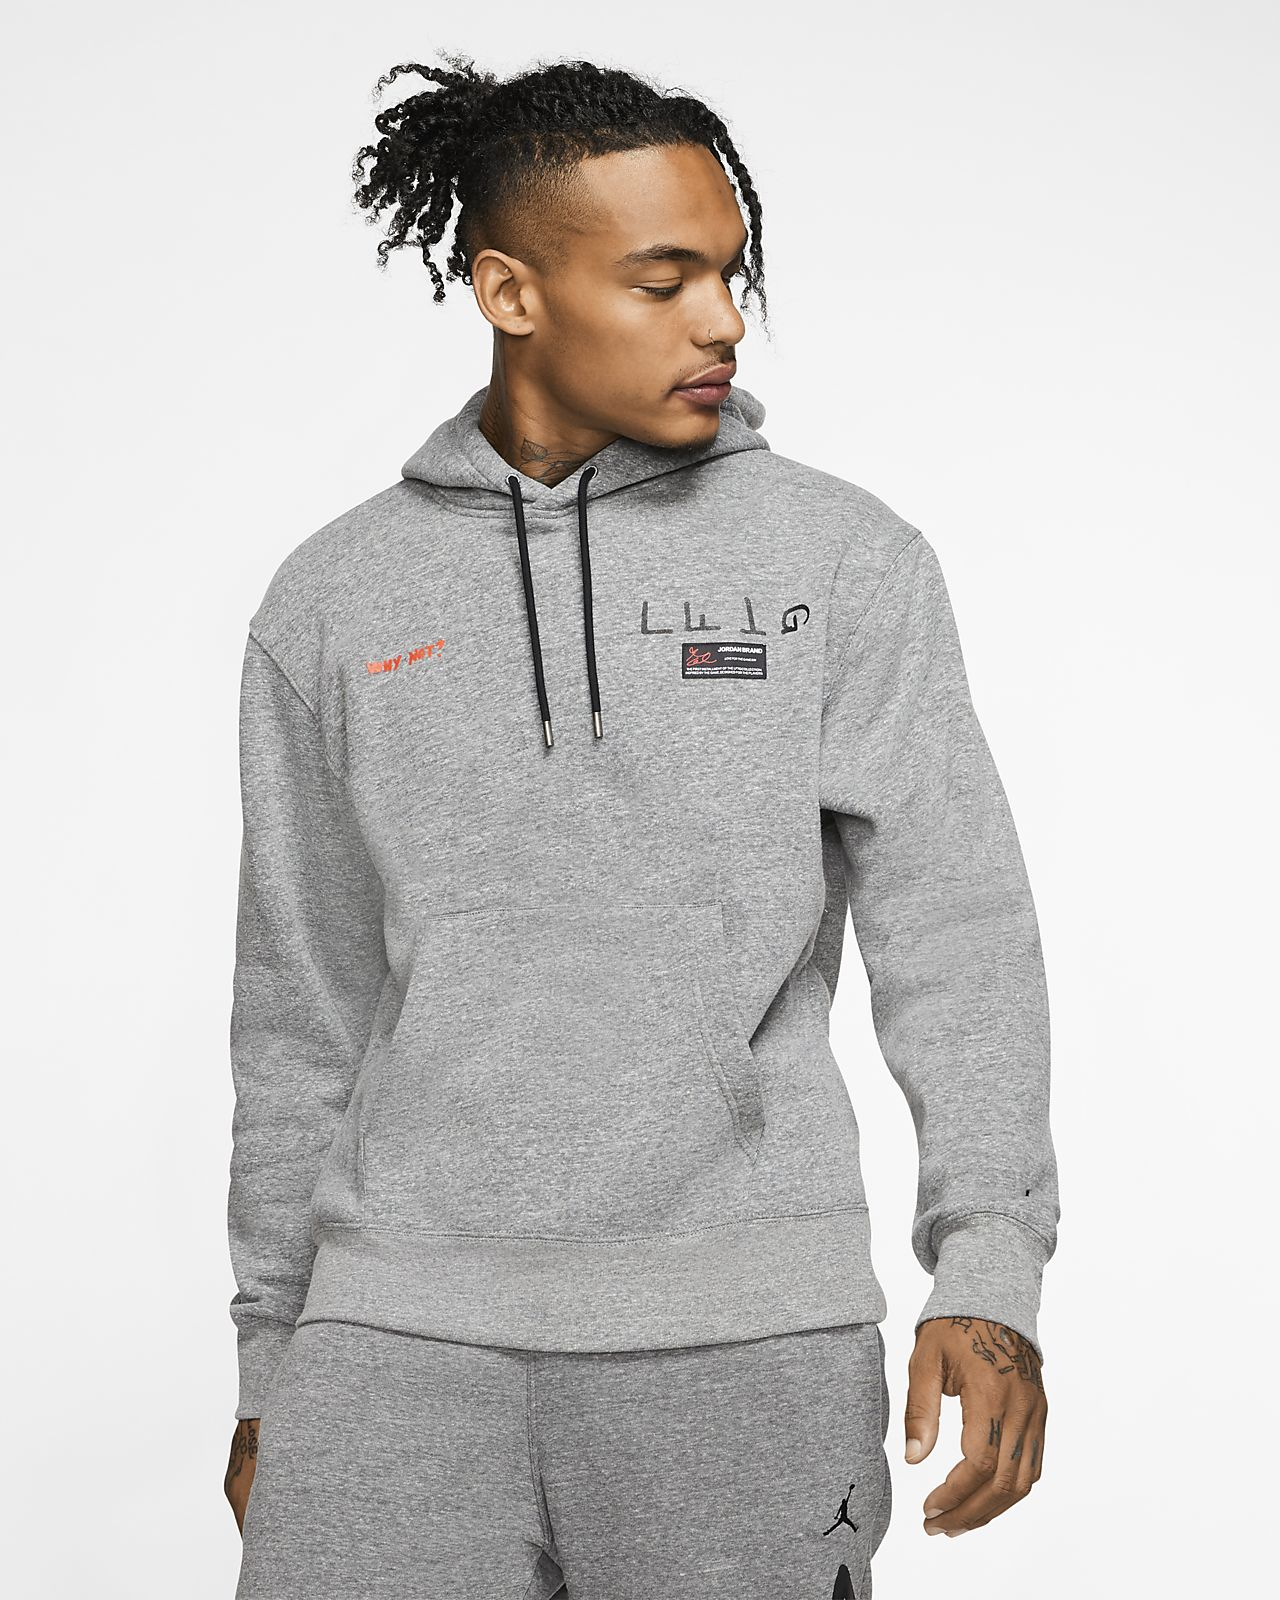 Jordan x Russell Westbrook Why Not? Men's Fleece Pullover